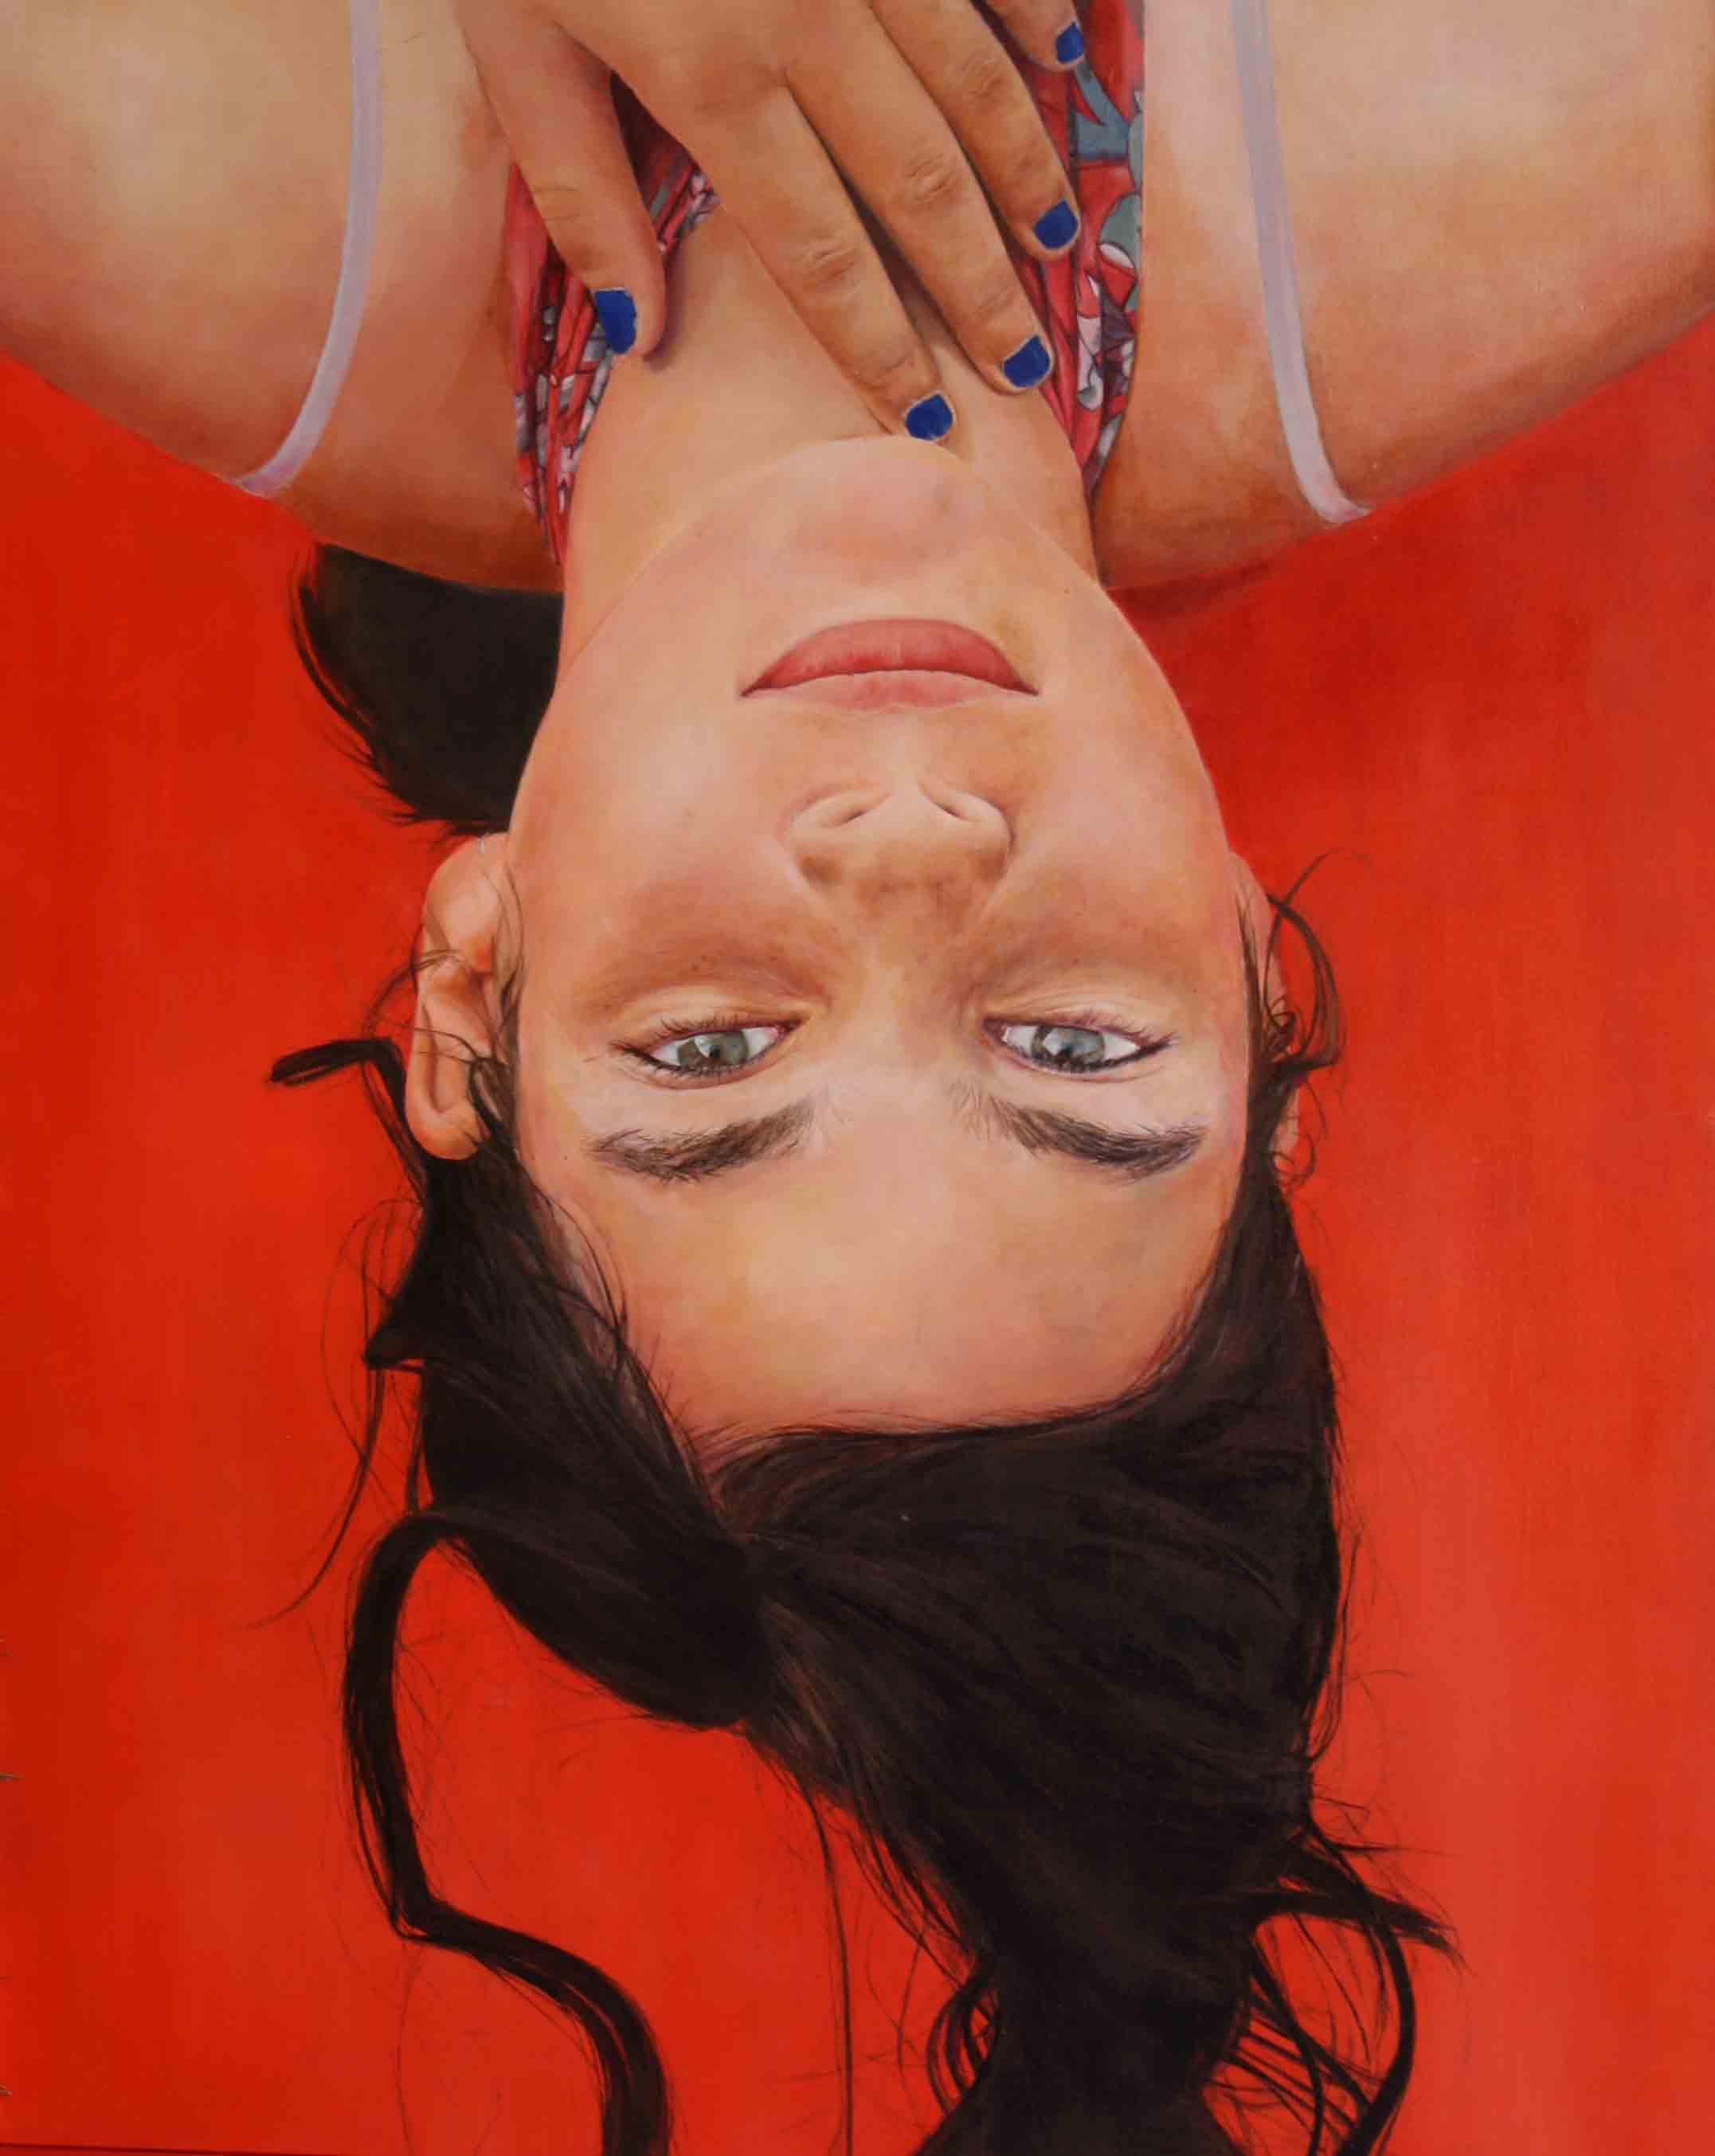 """Mi Mundo al revés"" (2011) - Tania Sánchez Ortiz - Tania S. Ortiz"